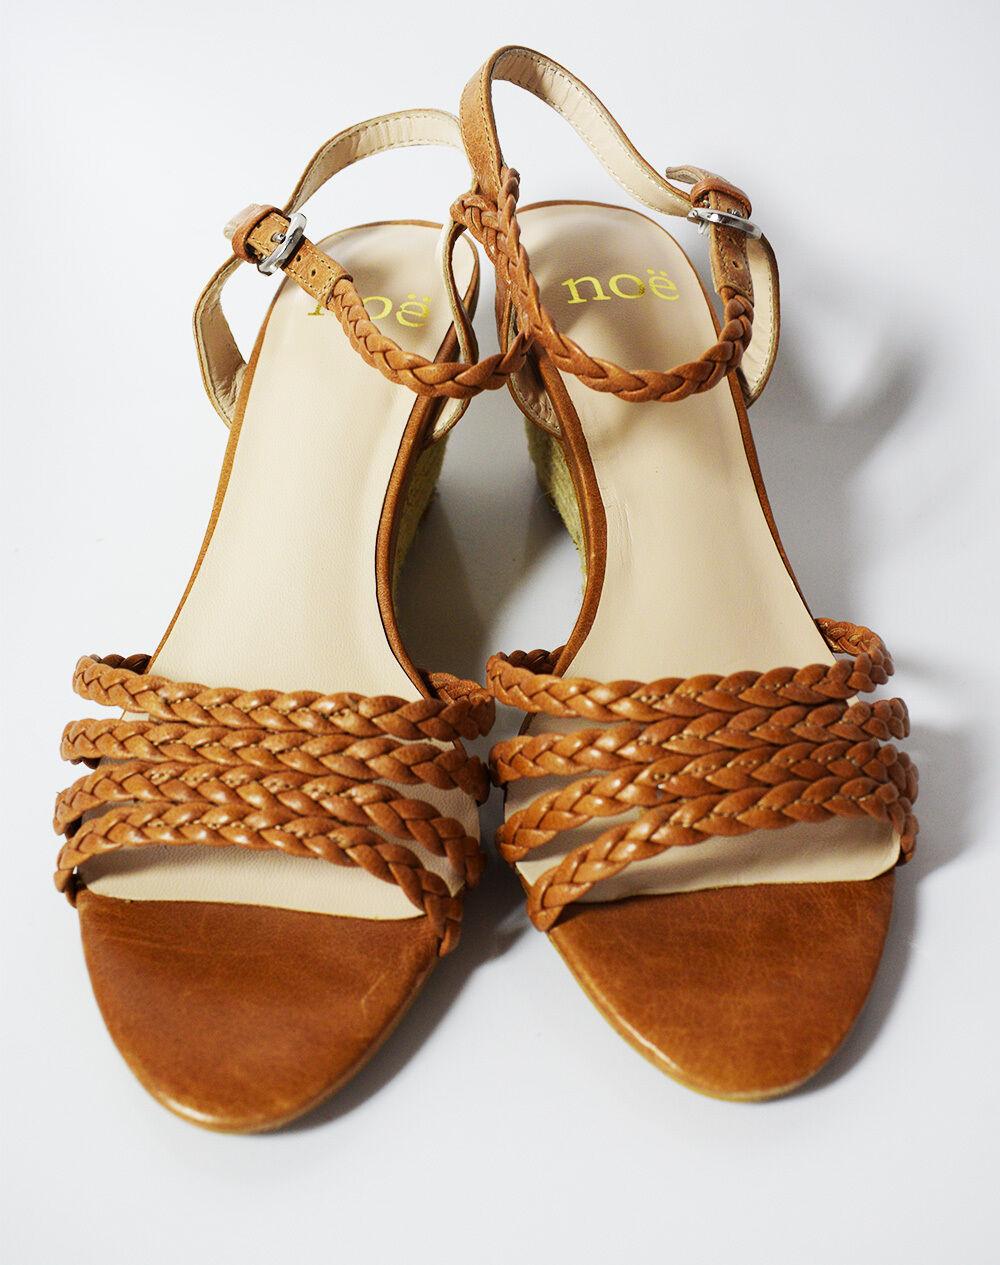 Noe Cuir Plateforme Femmes Sandales Chaussures Chaussons Marron Marron Marron a0431f